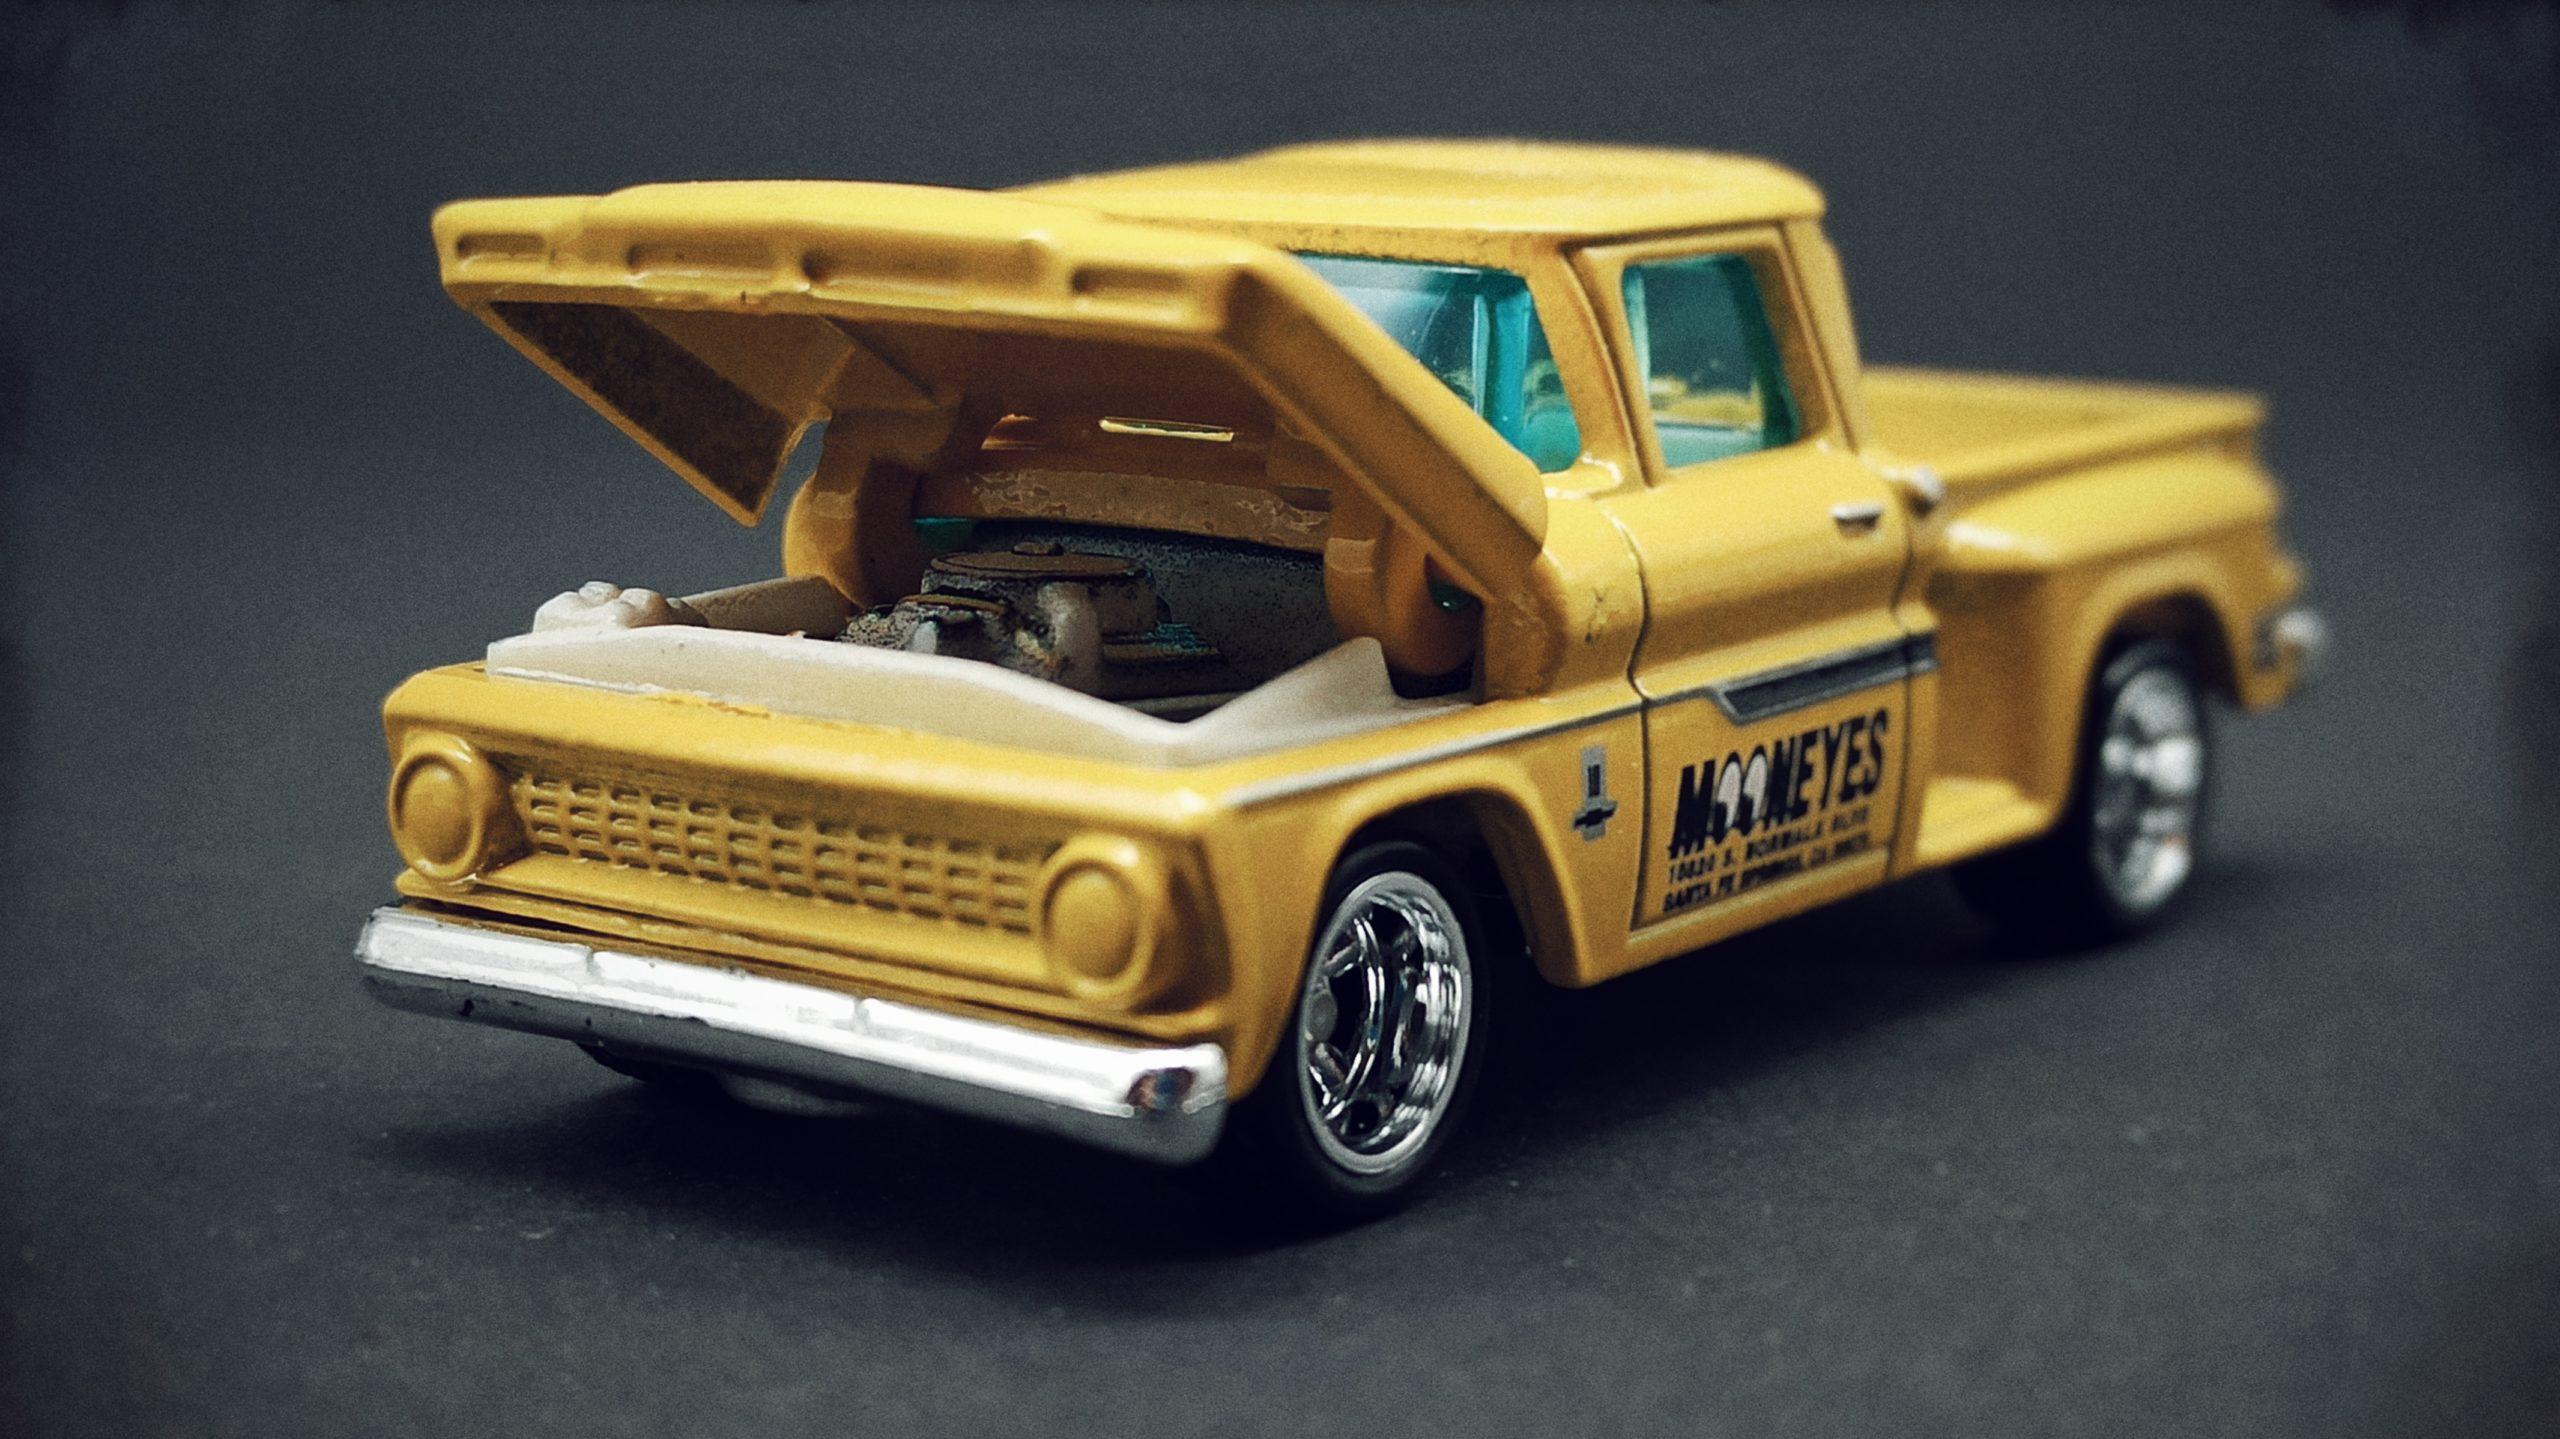 Matchbox Collectors Series '63 Chevy C10 Pickup Truck 1963 (GRK24) 2021 (3/20) yellow (Mooneyes) open hood